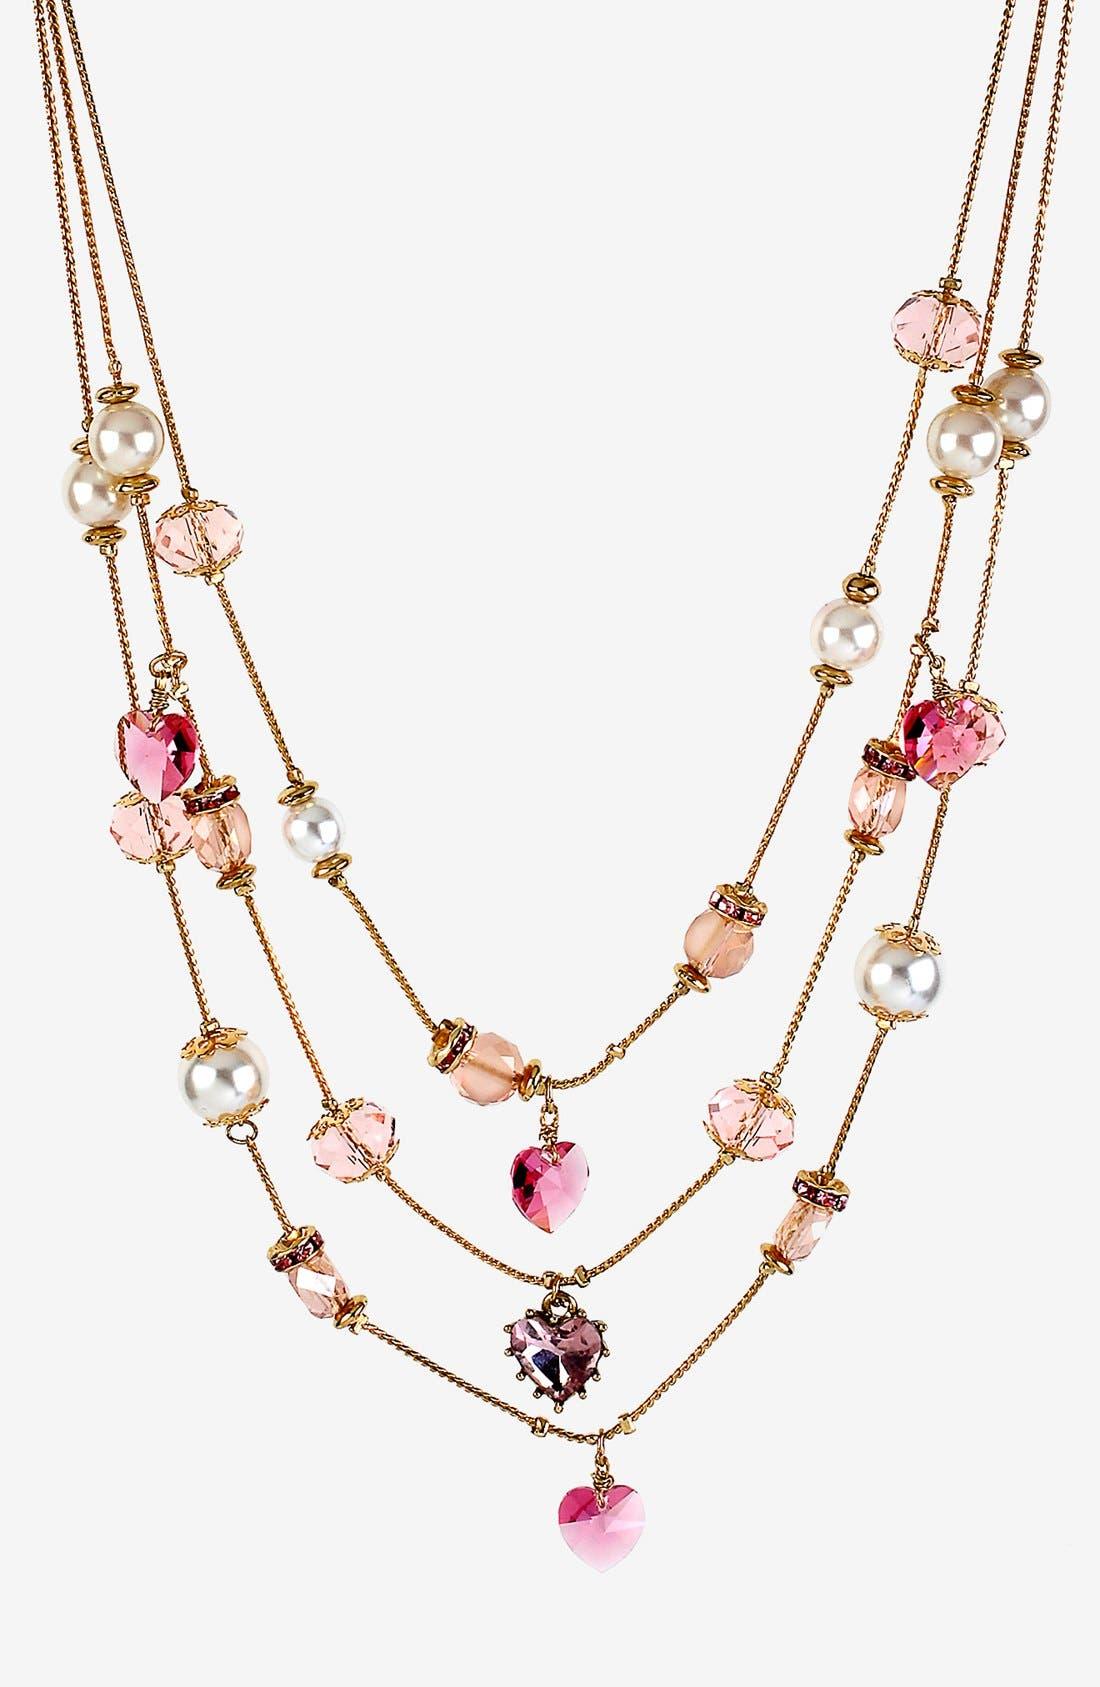 Alternate Image 1 Selected - Betsey Johnson 'Iconic Pinkalicious' Multistrand Necklace